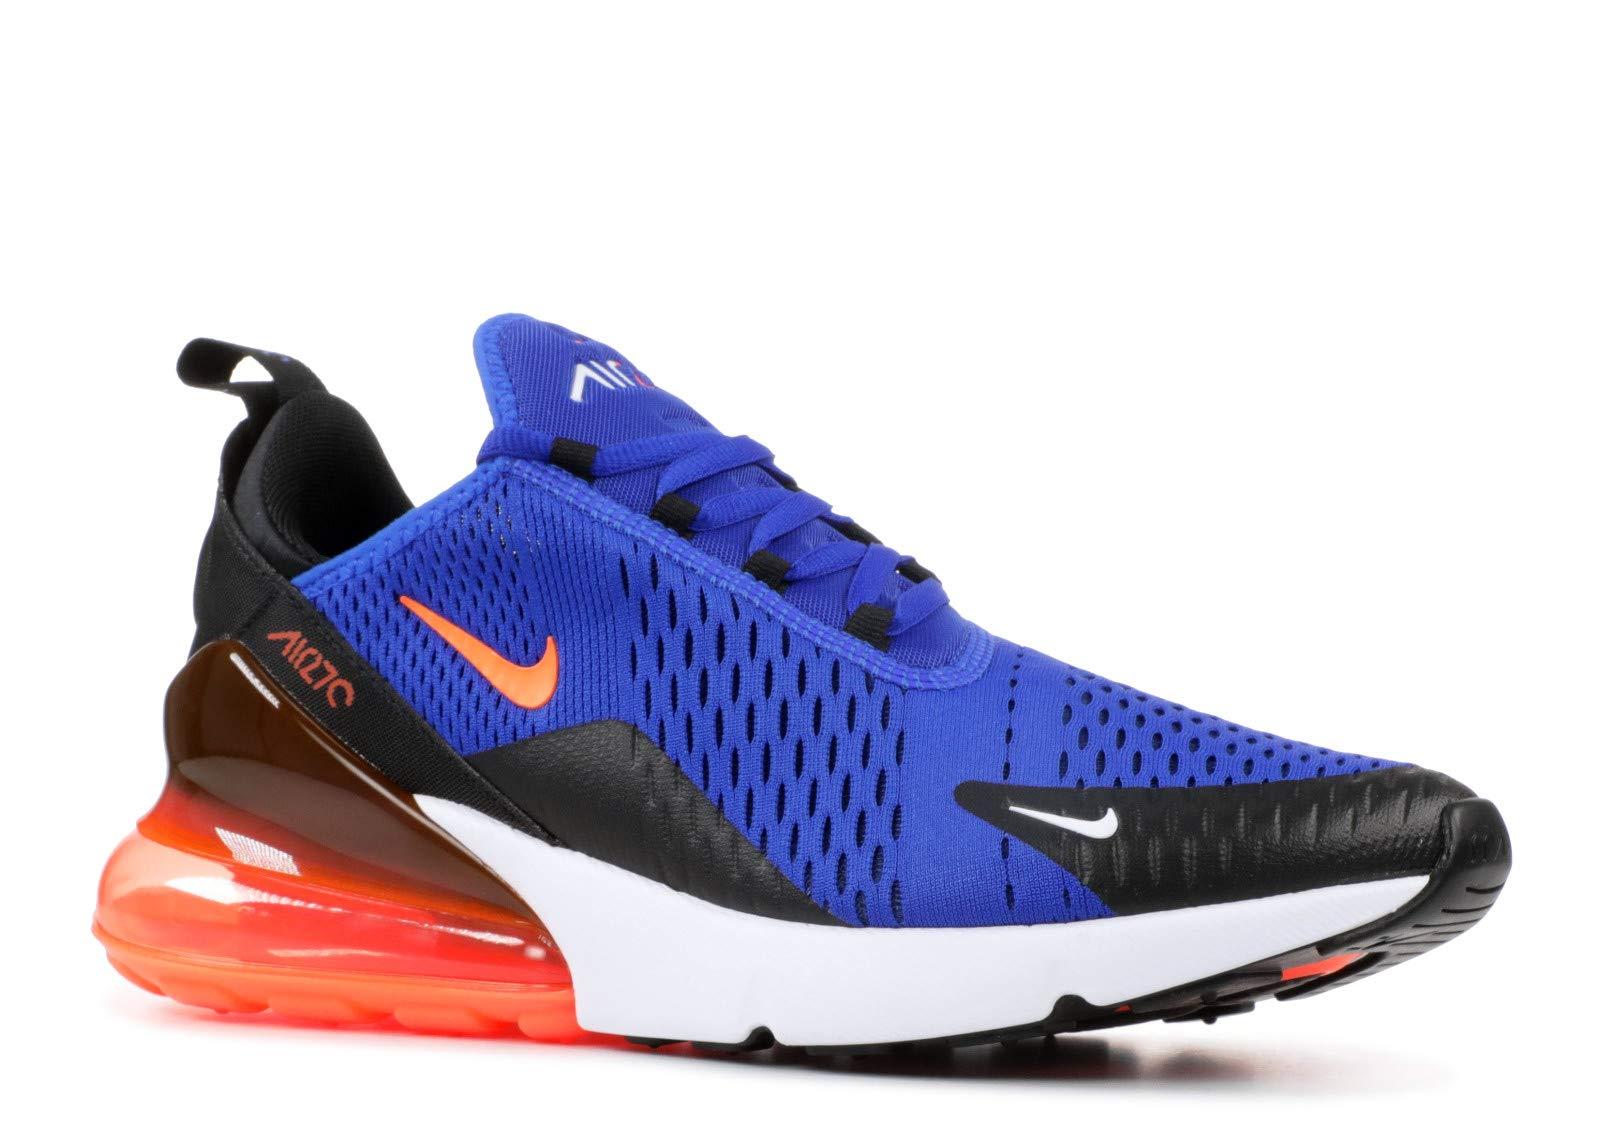 5f54c4c4fa Galleon - Nike Air Max 270 Men's Shoes Racer Blue/Hyper Crimson/Black Ah8050 -401 (8.5 D(M) US)